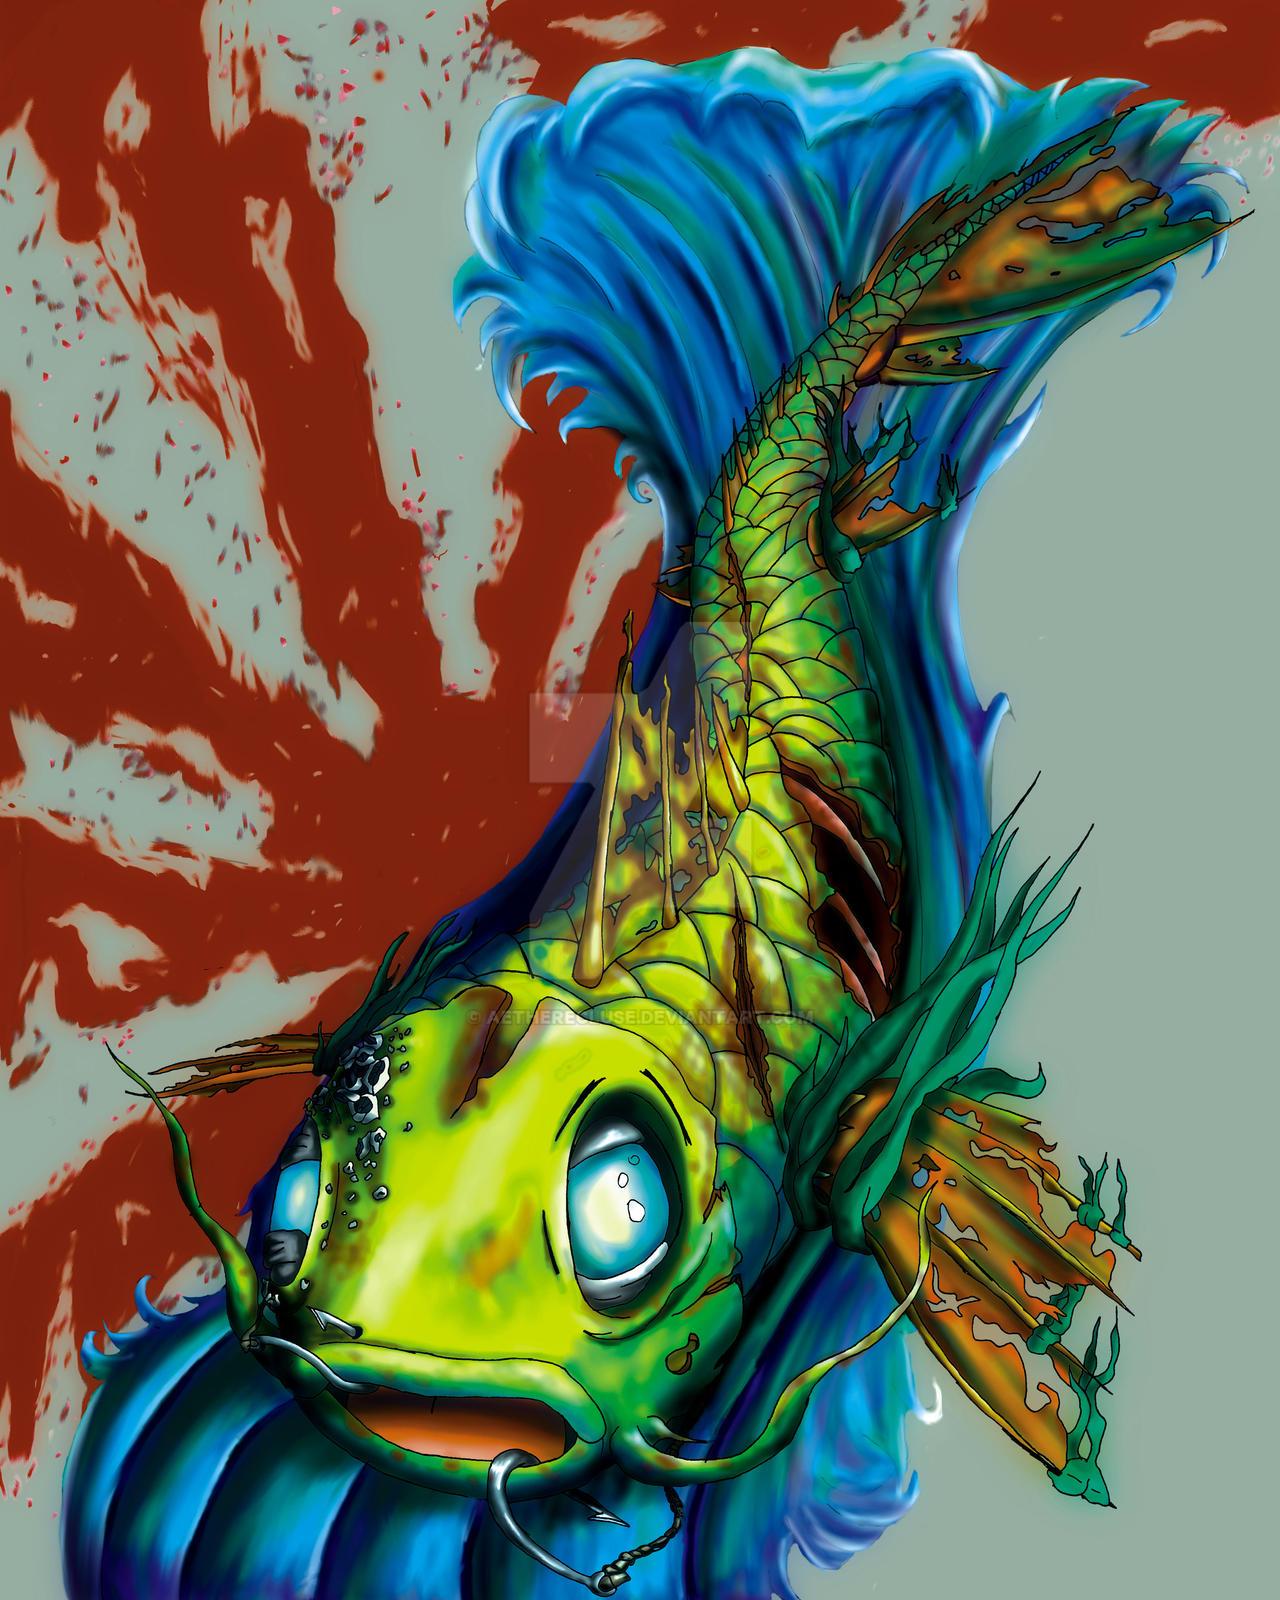 Zombie koi by aetherecluse on deviantart for Koi carp artwork